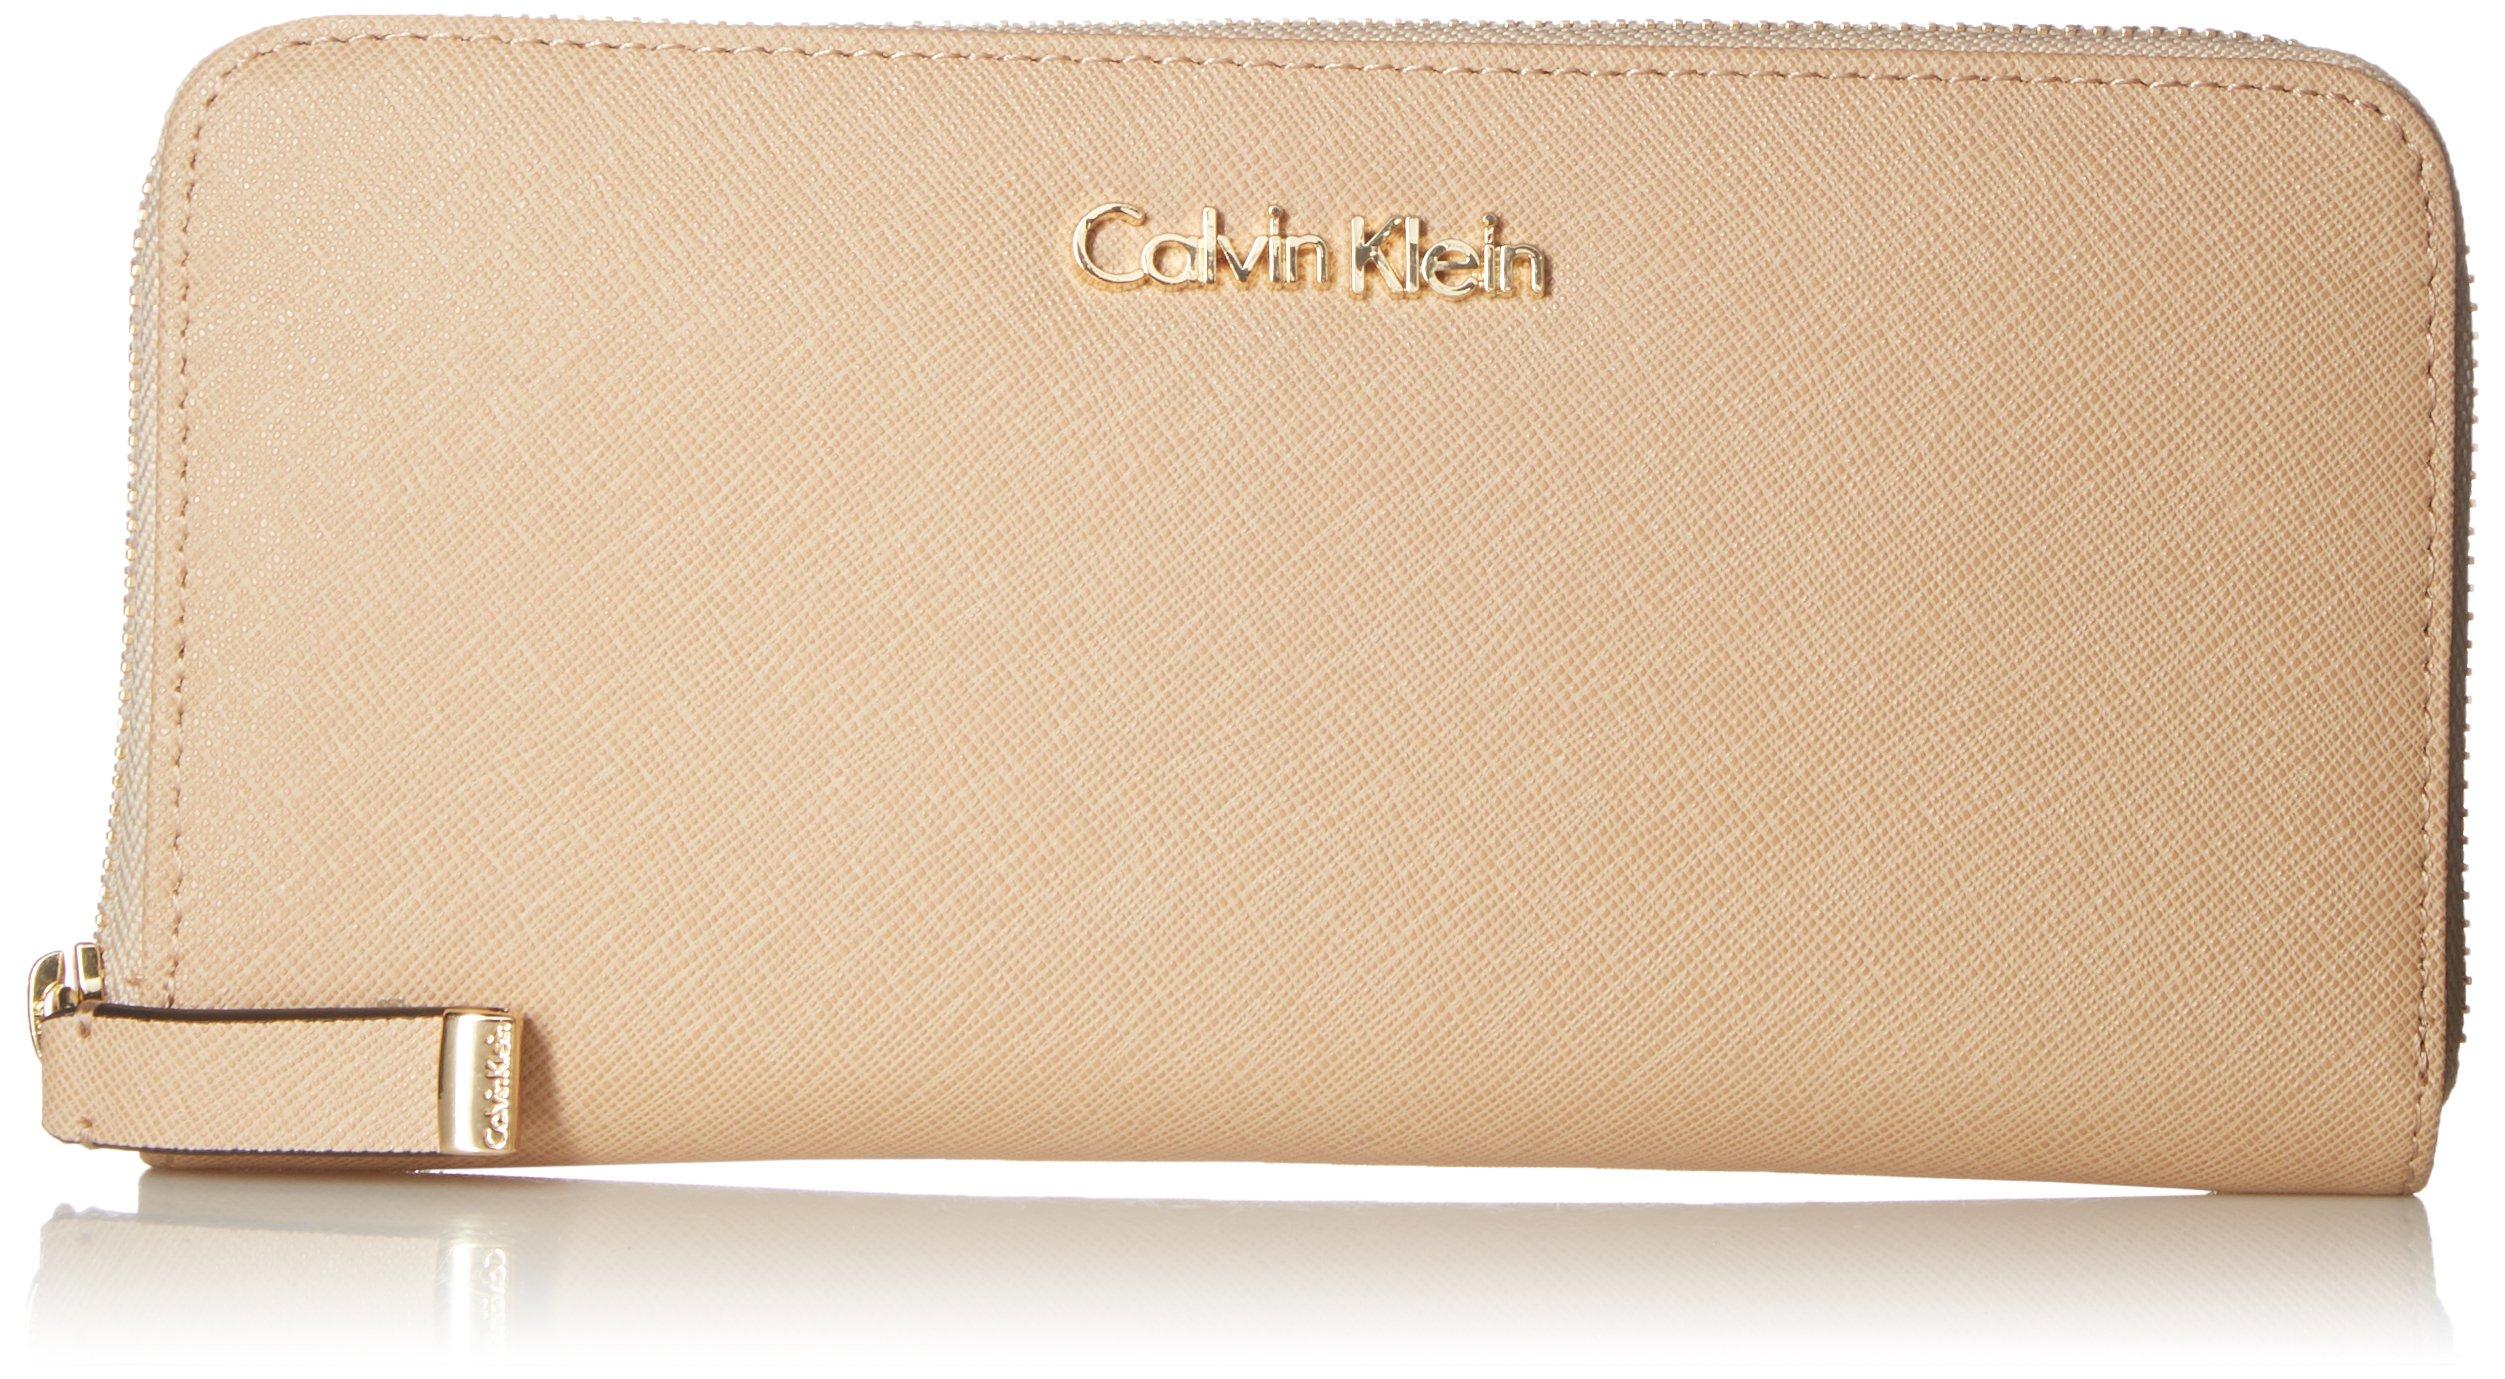 Calvin Klein SaffiaNo Zip Continental Wallet, Nude, One Size